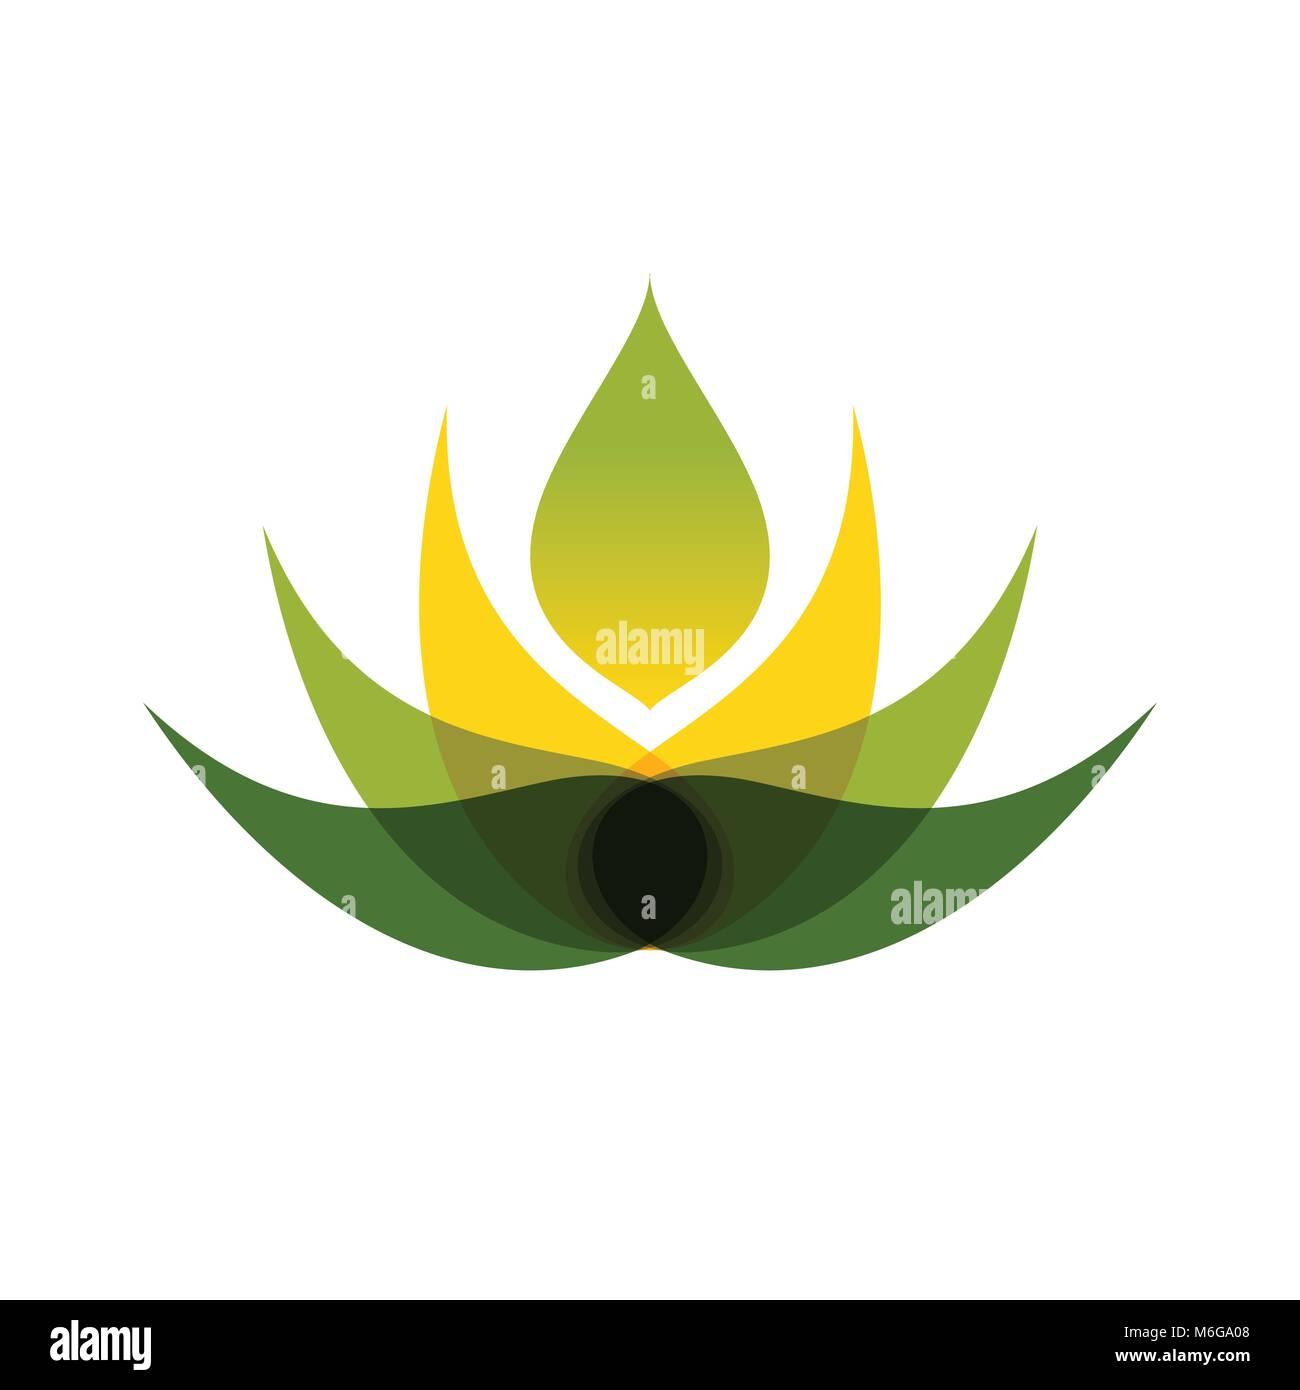 Lotus flower design stock photos lotus flower design stock images abstract multiply lotus flower vector symbol graphic logo design stock image mightylinksfo Images